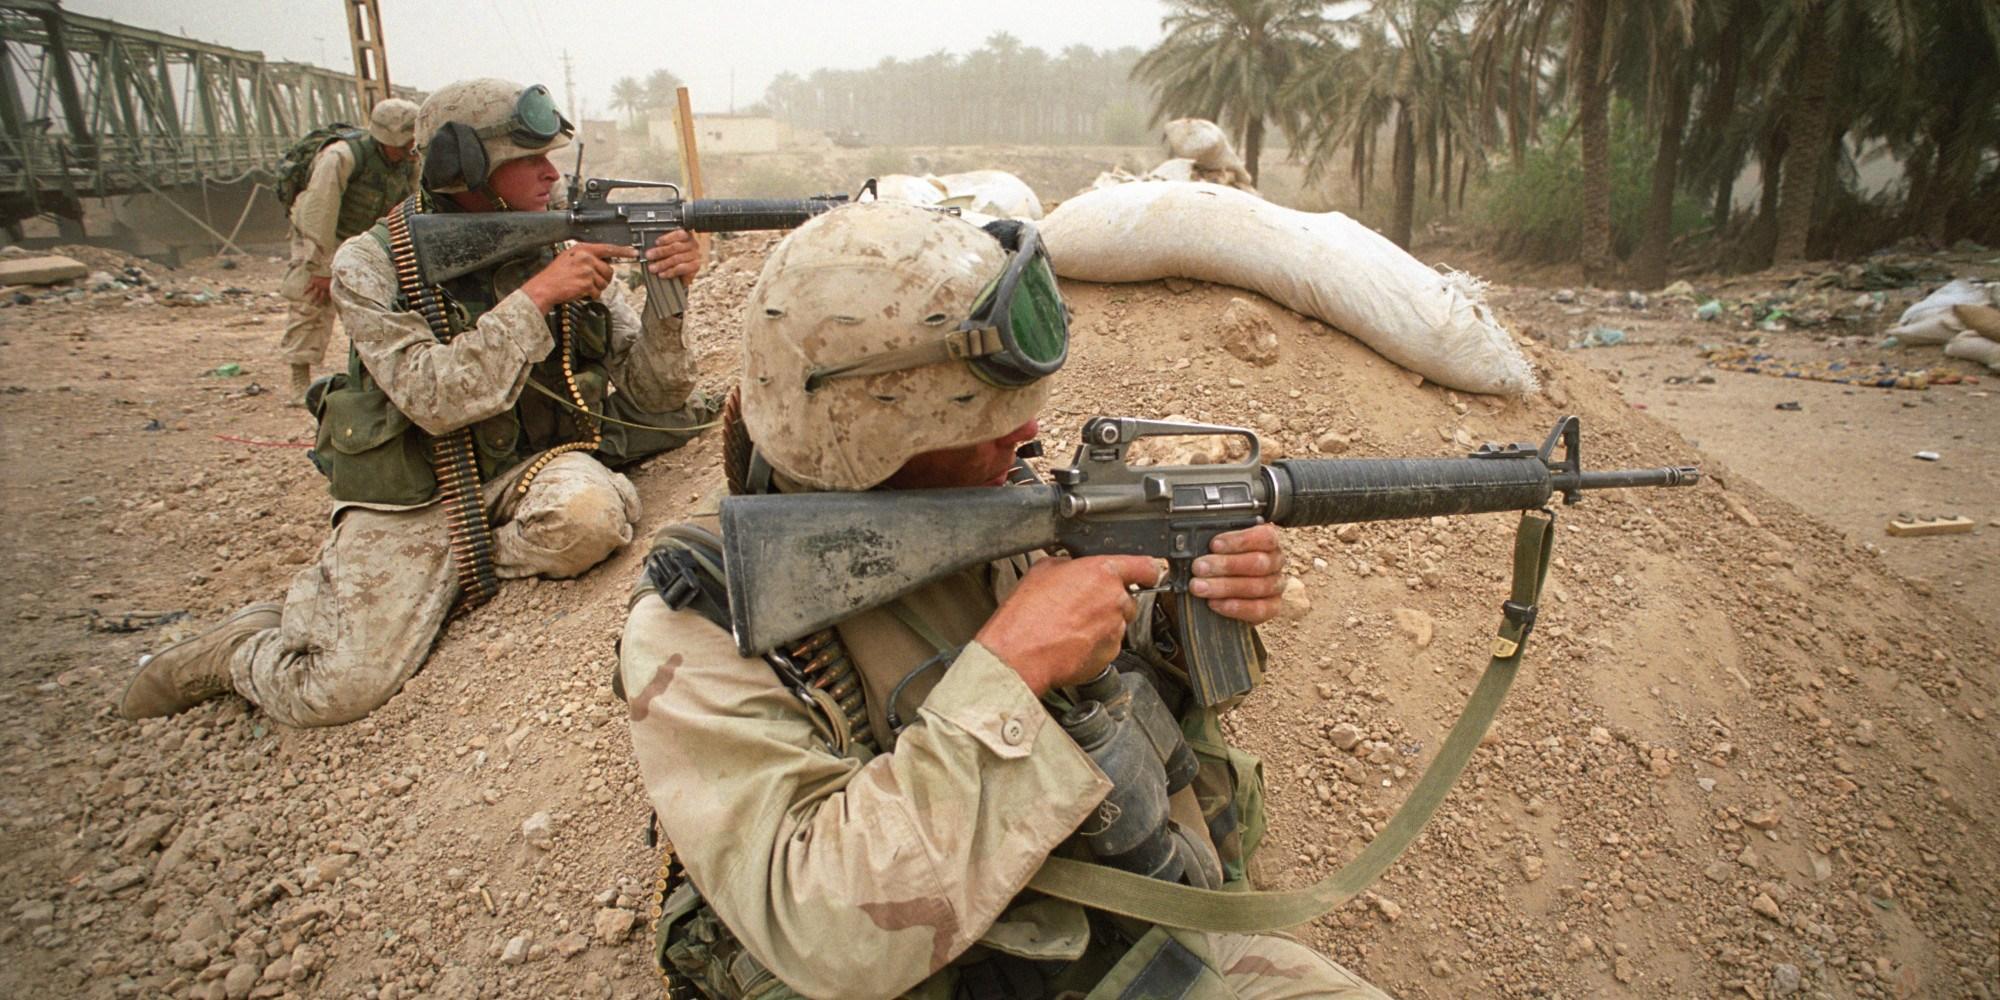 Colt M16A2 assault rifle has well-earned combat reputation